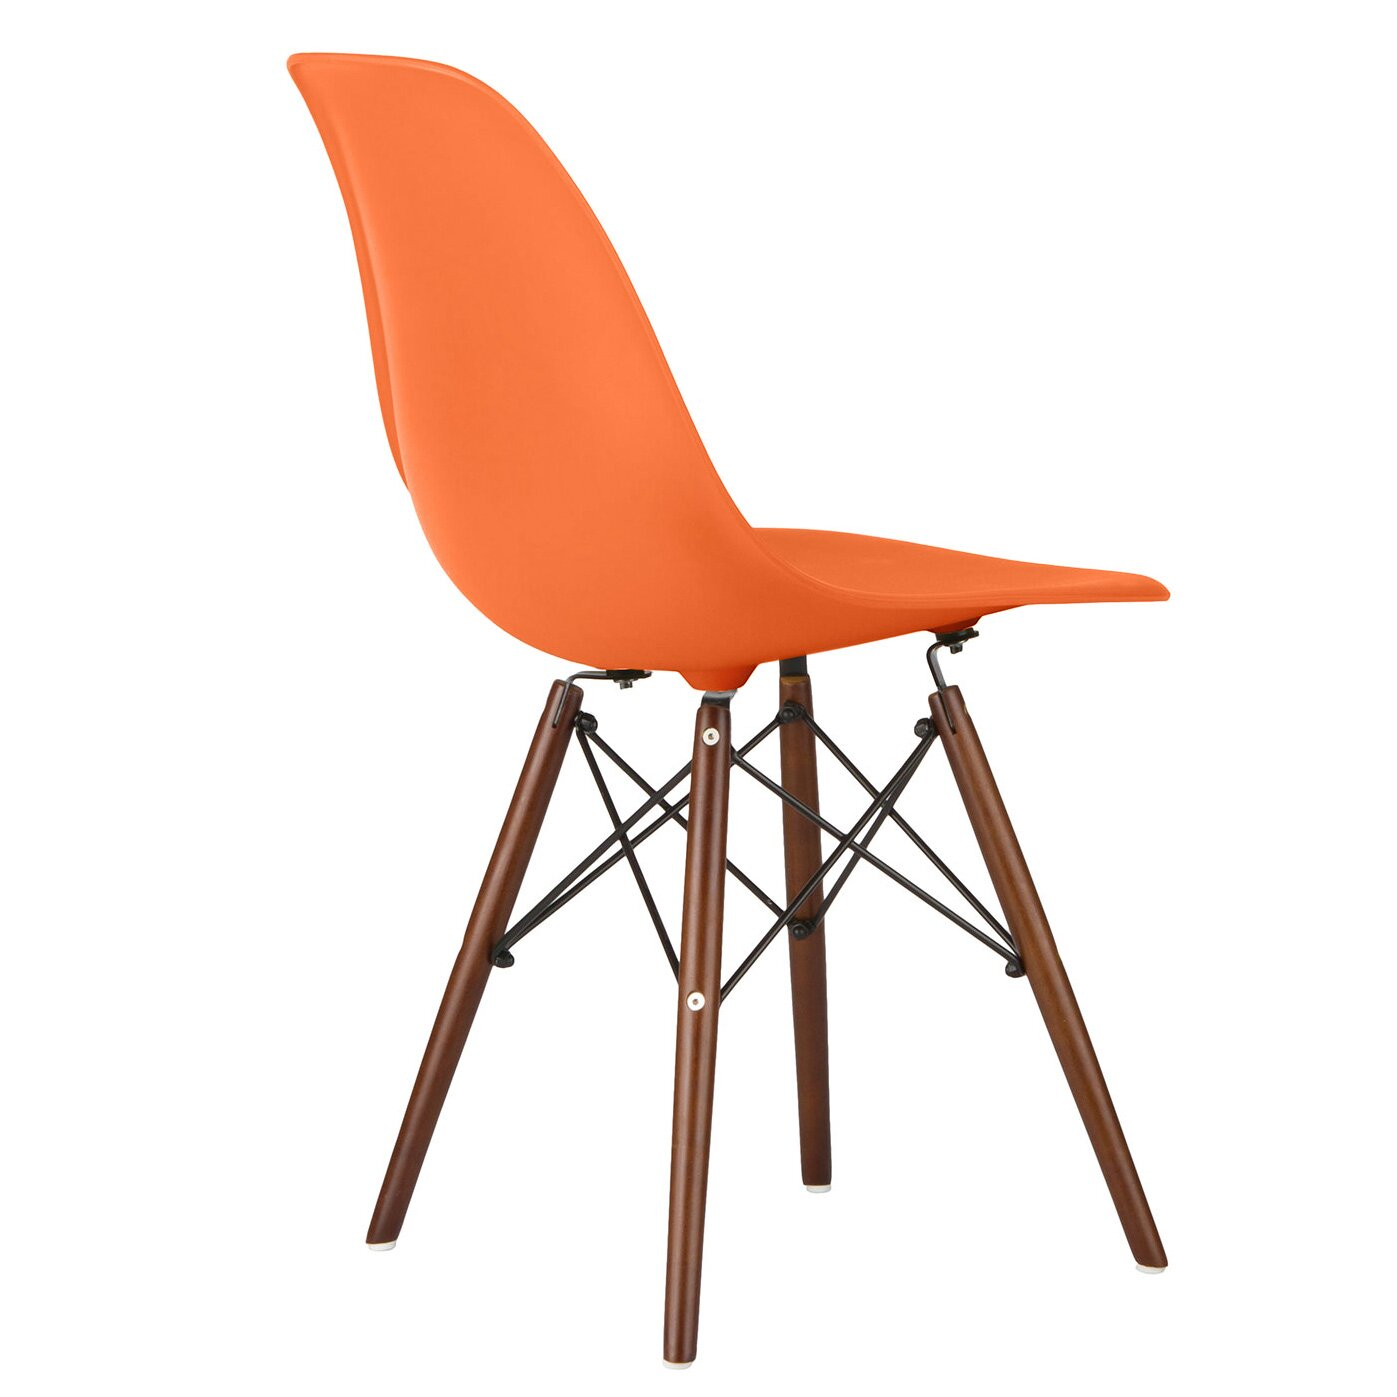 Emodern decor side chair wayfair for Emodern decor